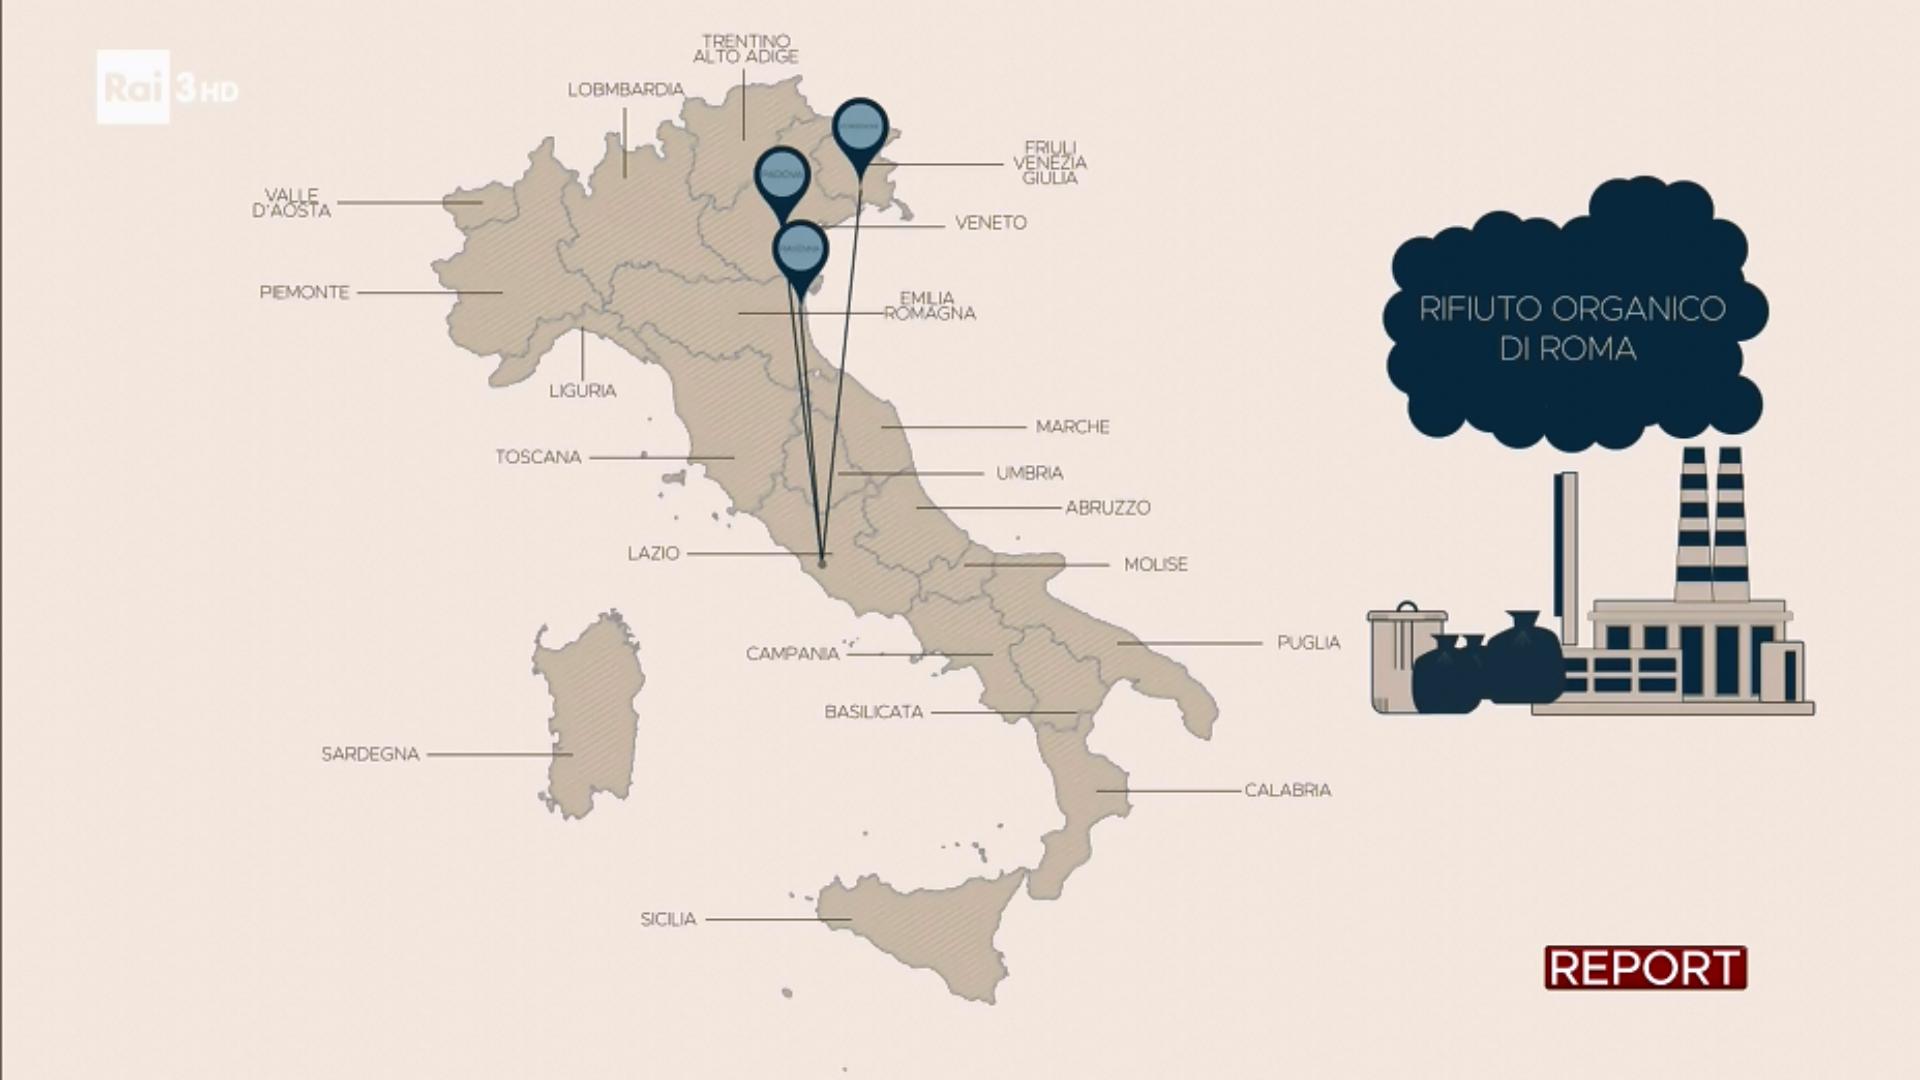 dove va rifiuto organico roma report - 1